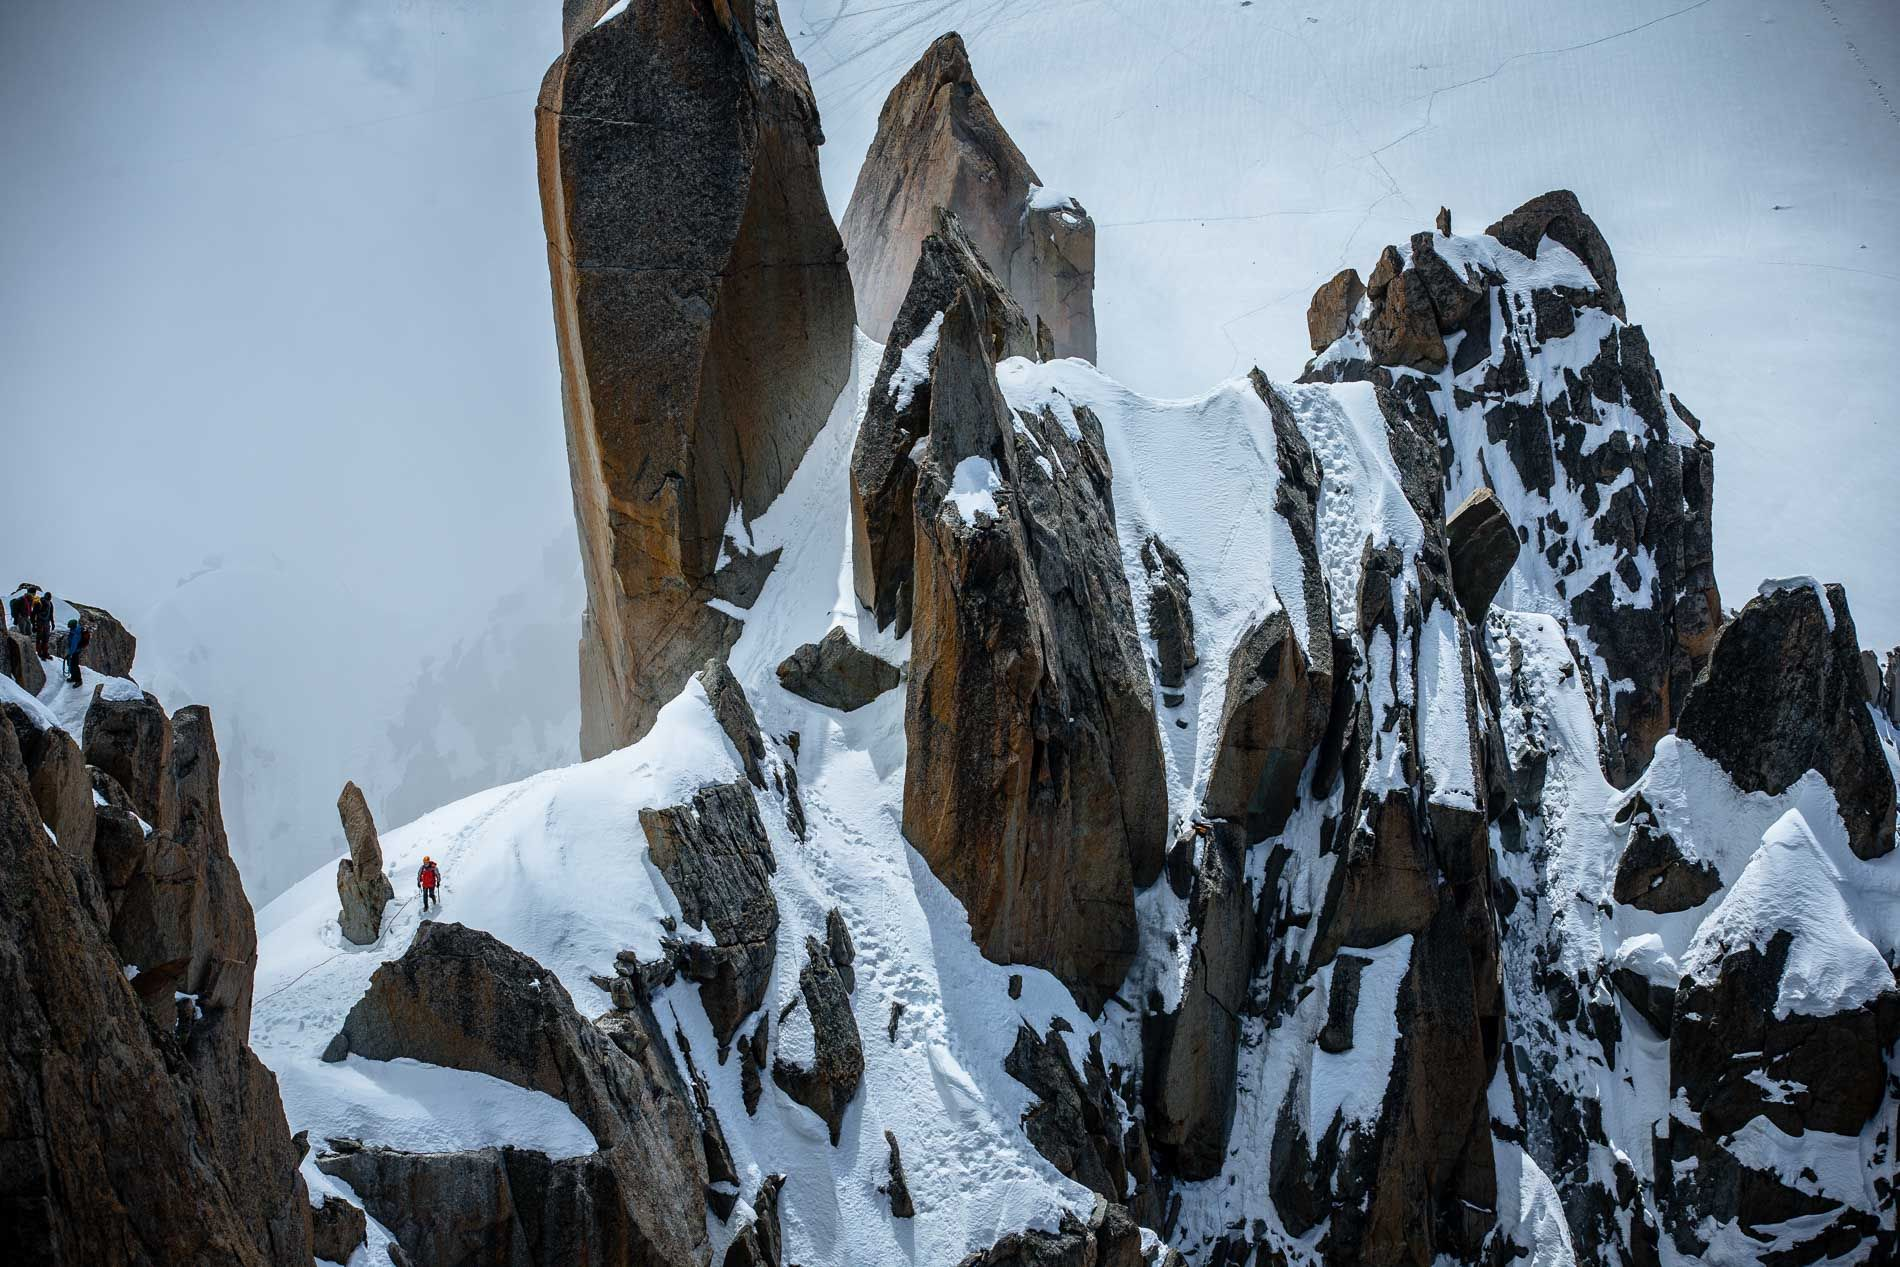 The Arc'teryx Alpine Academy returns to Chamonix   The Bird   Arc'teryx Blog